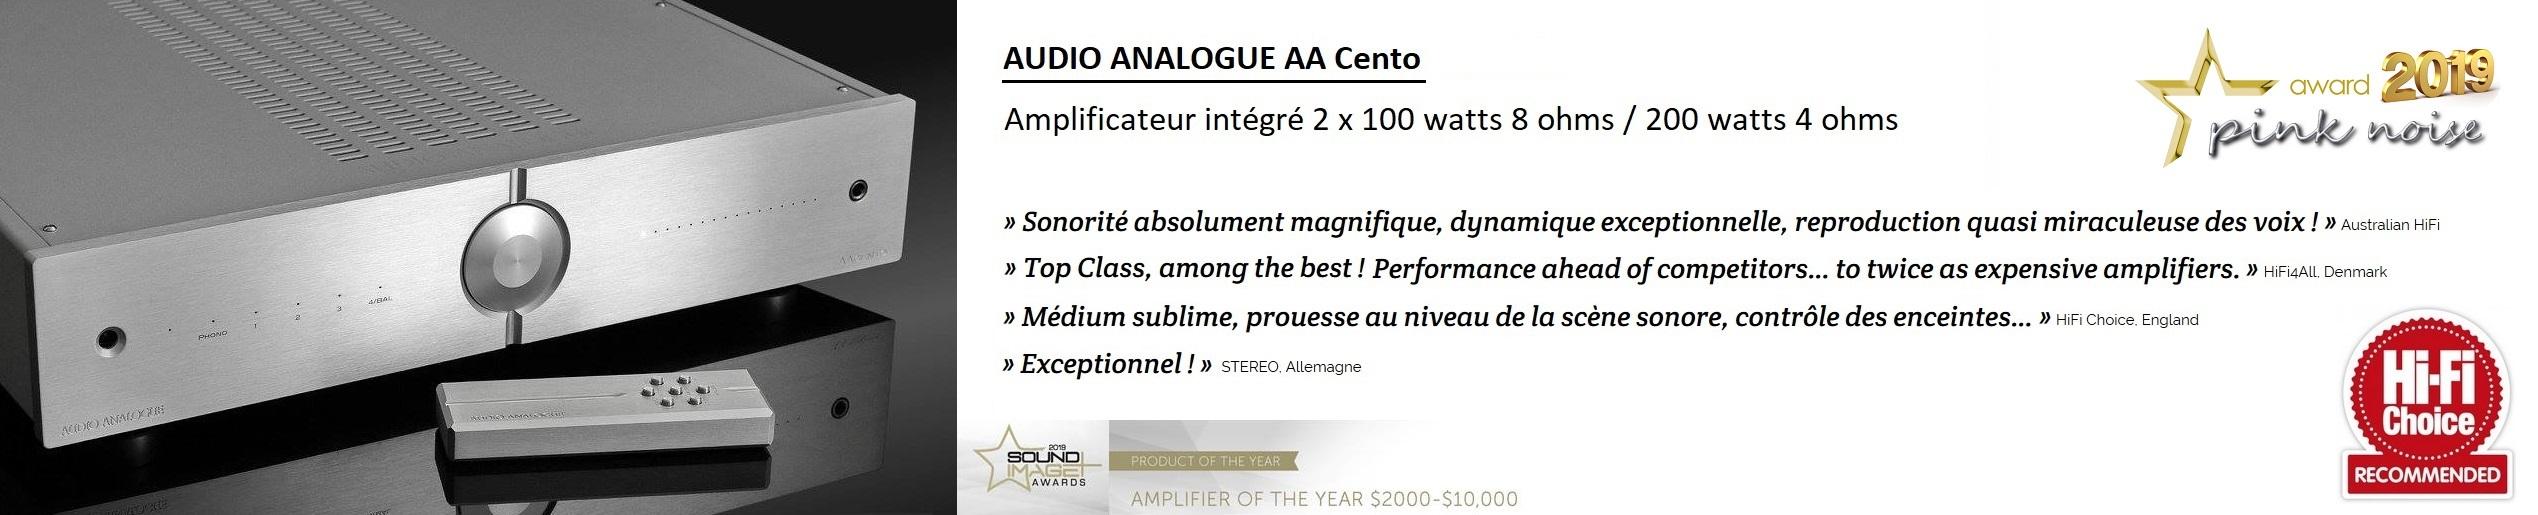 Audio AnalogueAACento